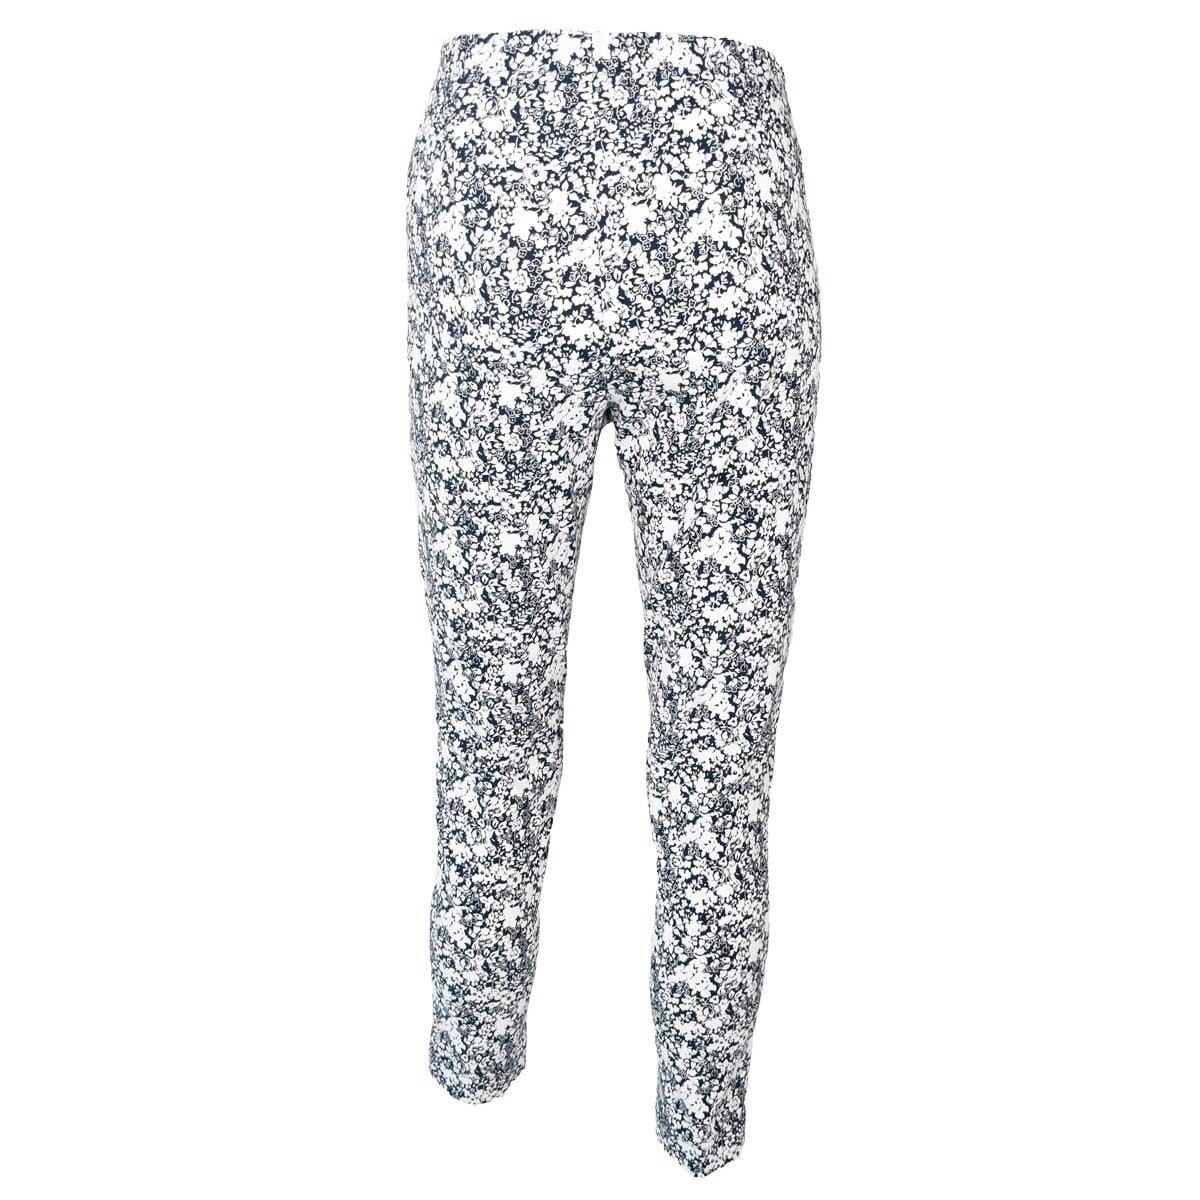 Pantalon Tipo Legging Grafico Apostrophe Para Dama